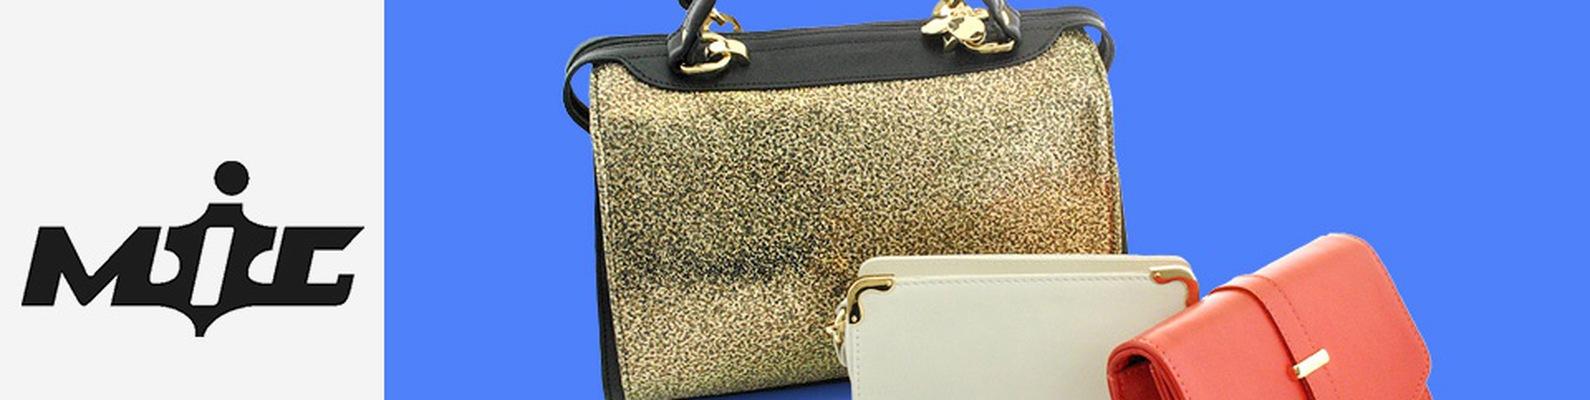 858ec1098e2e Интернет магазин сумок MIS. Купить сумку.   ВКонтакте